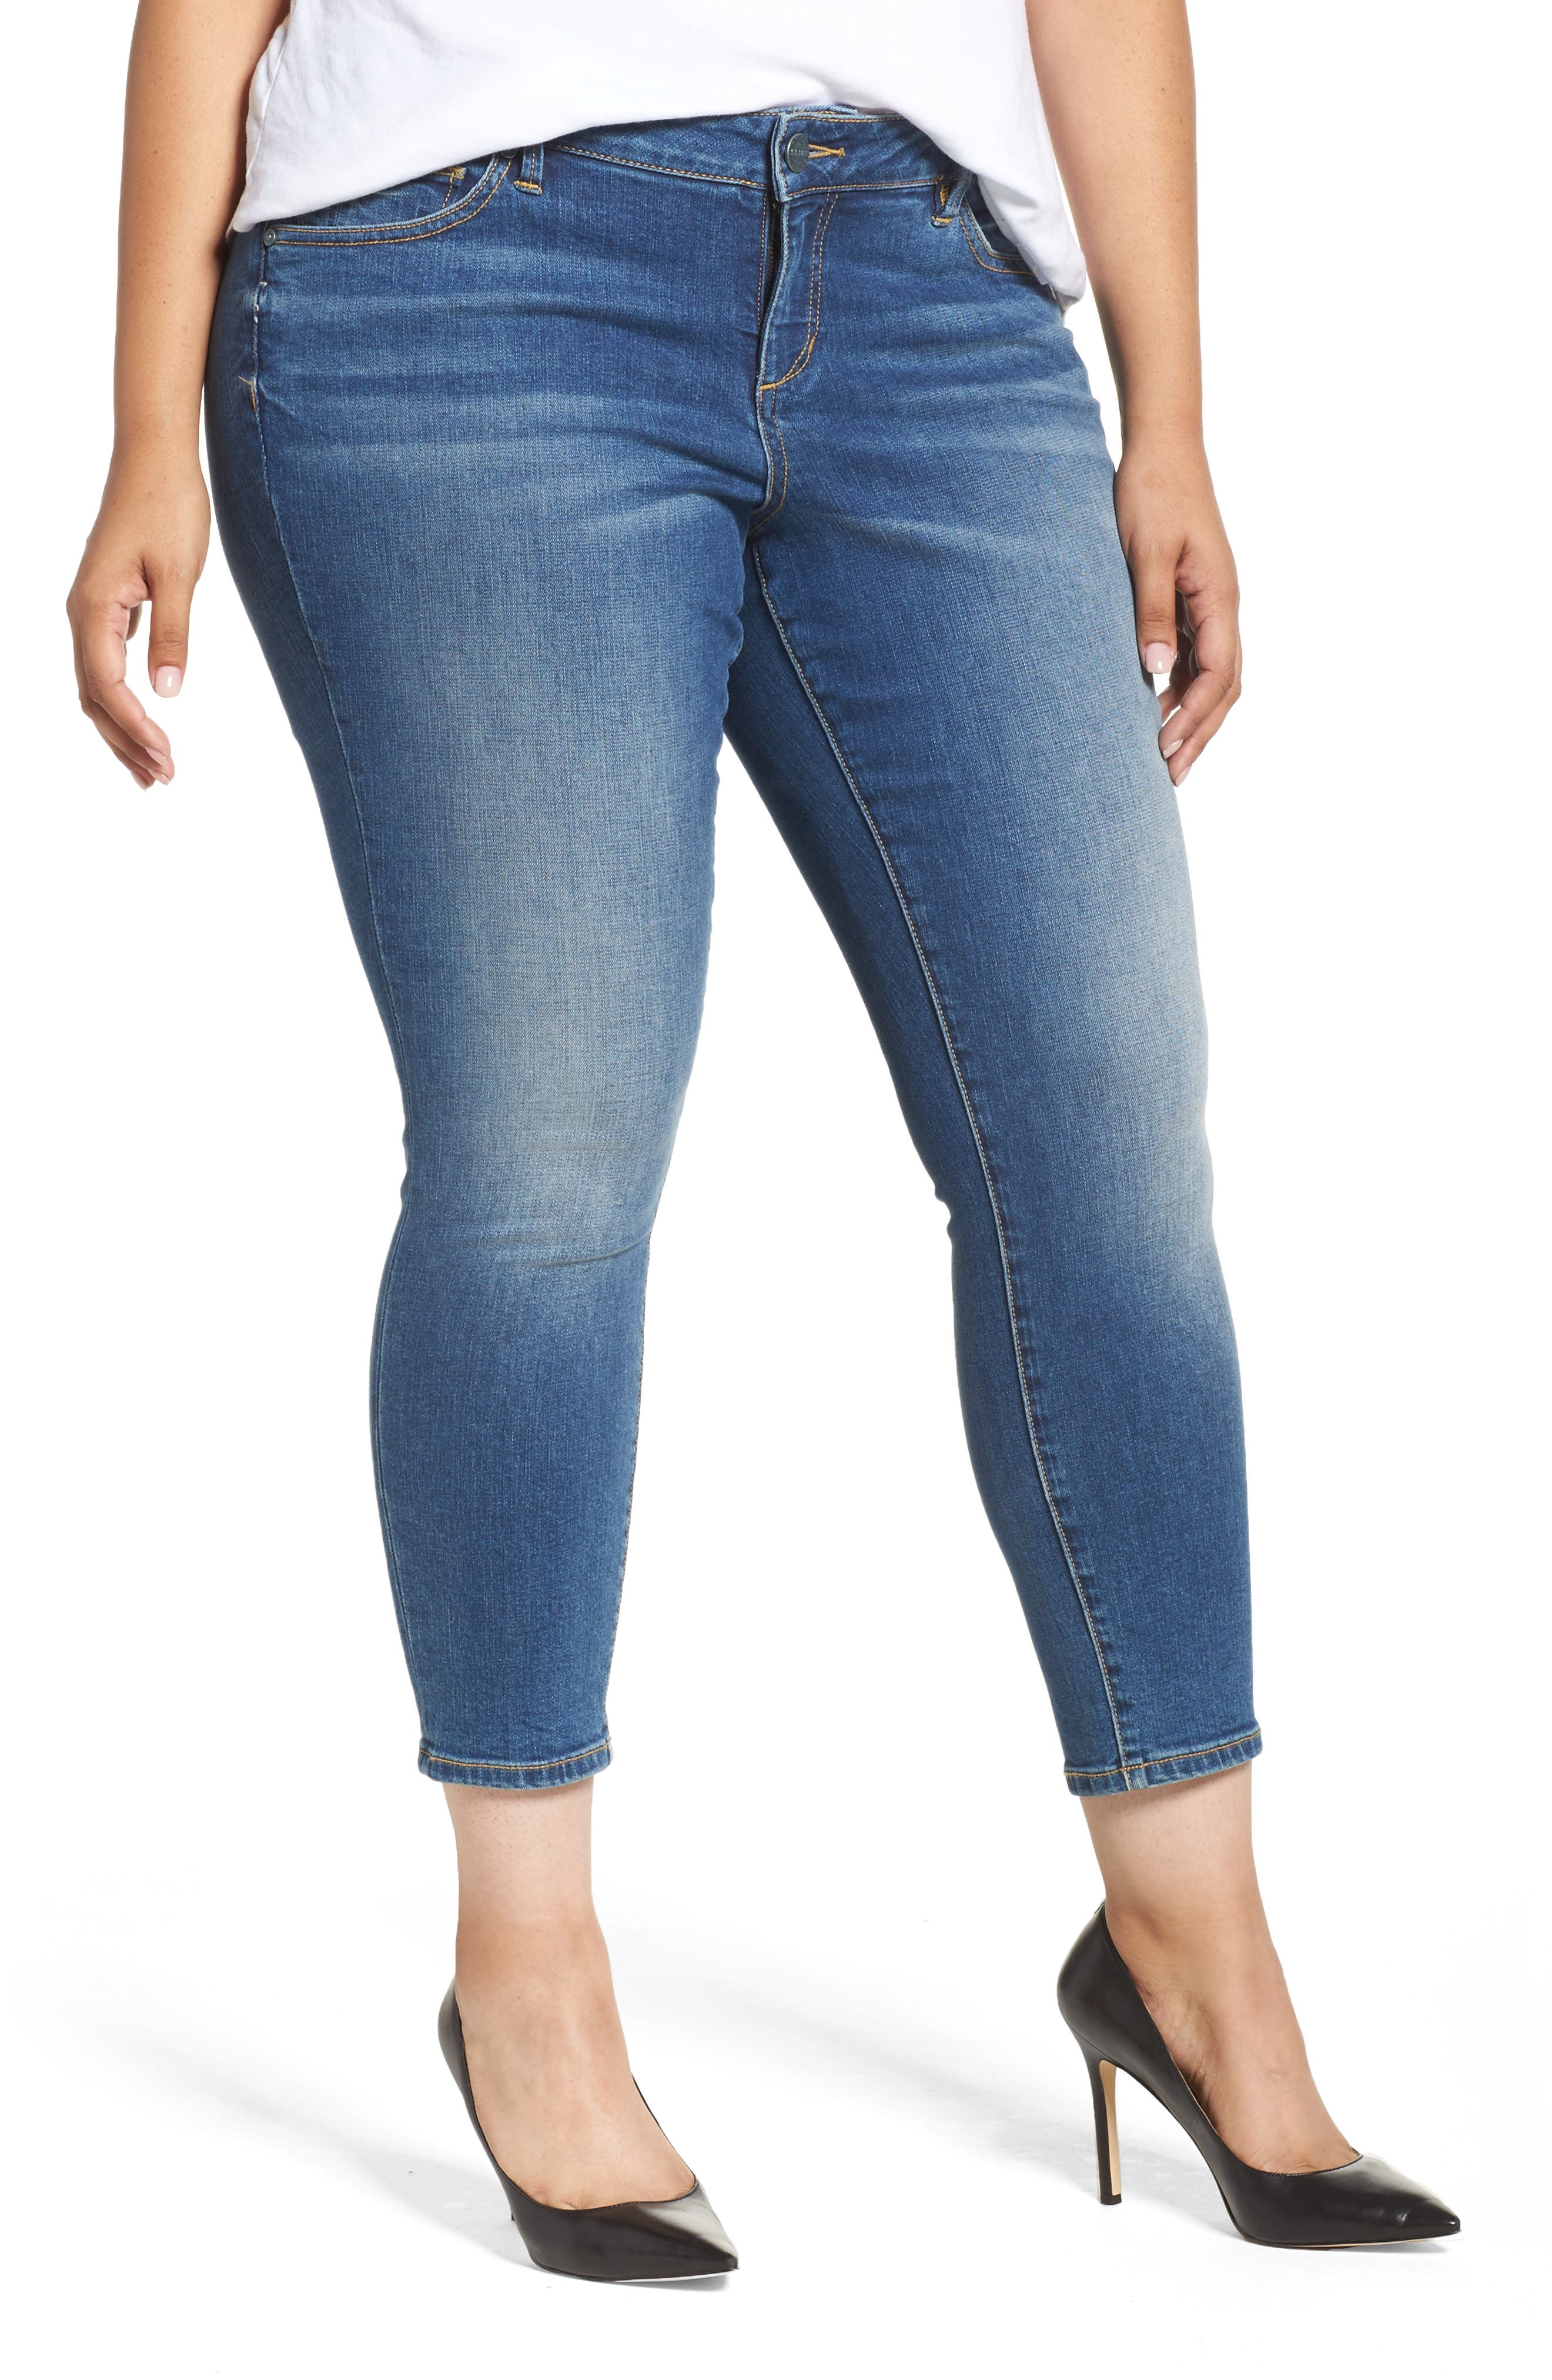 SLINK Jeans Skinny Ankle Jeans (Birdy) Plus Size)